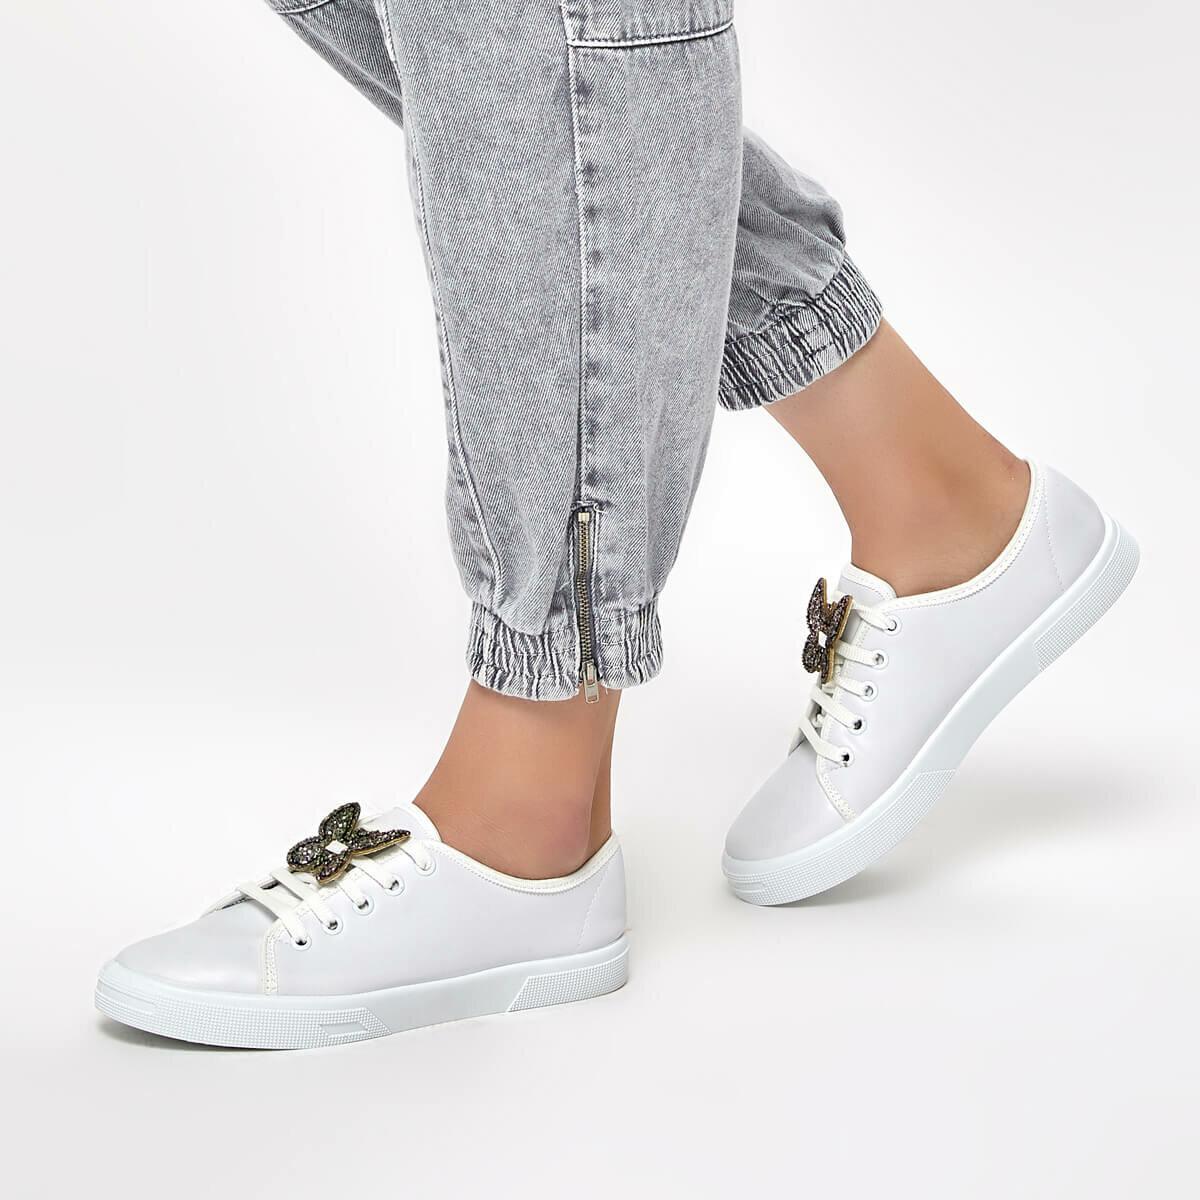 FLO 91.313423.Z White Women 'S Sneaker Shoes Polaris